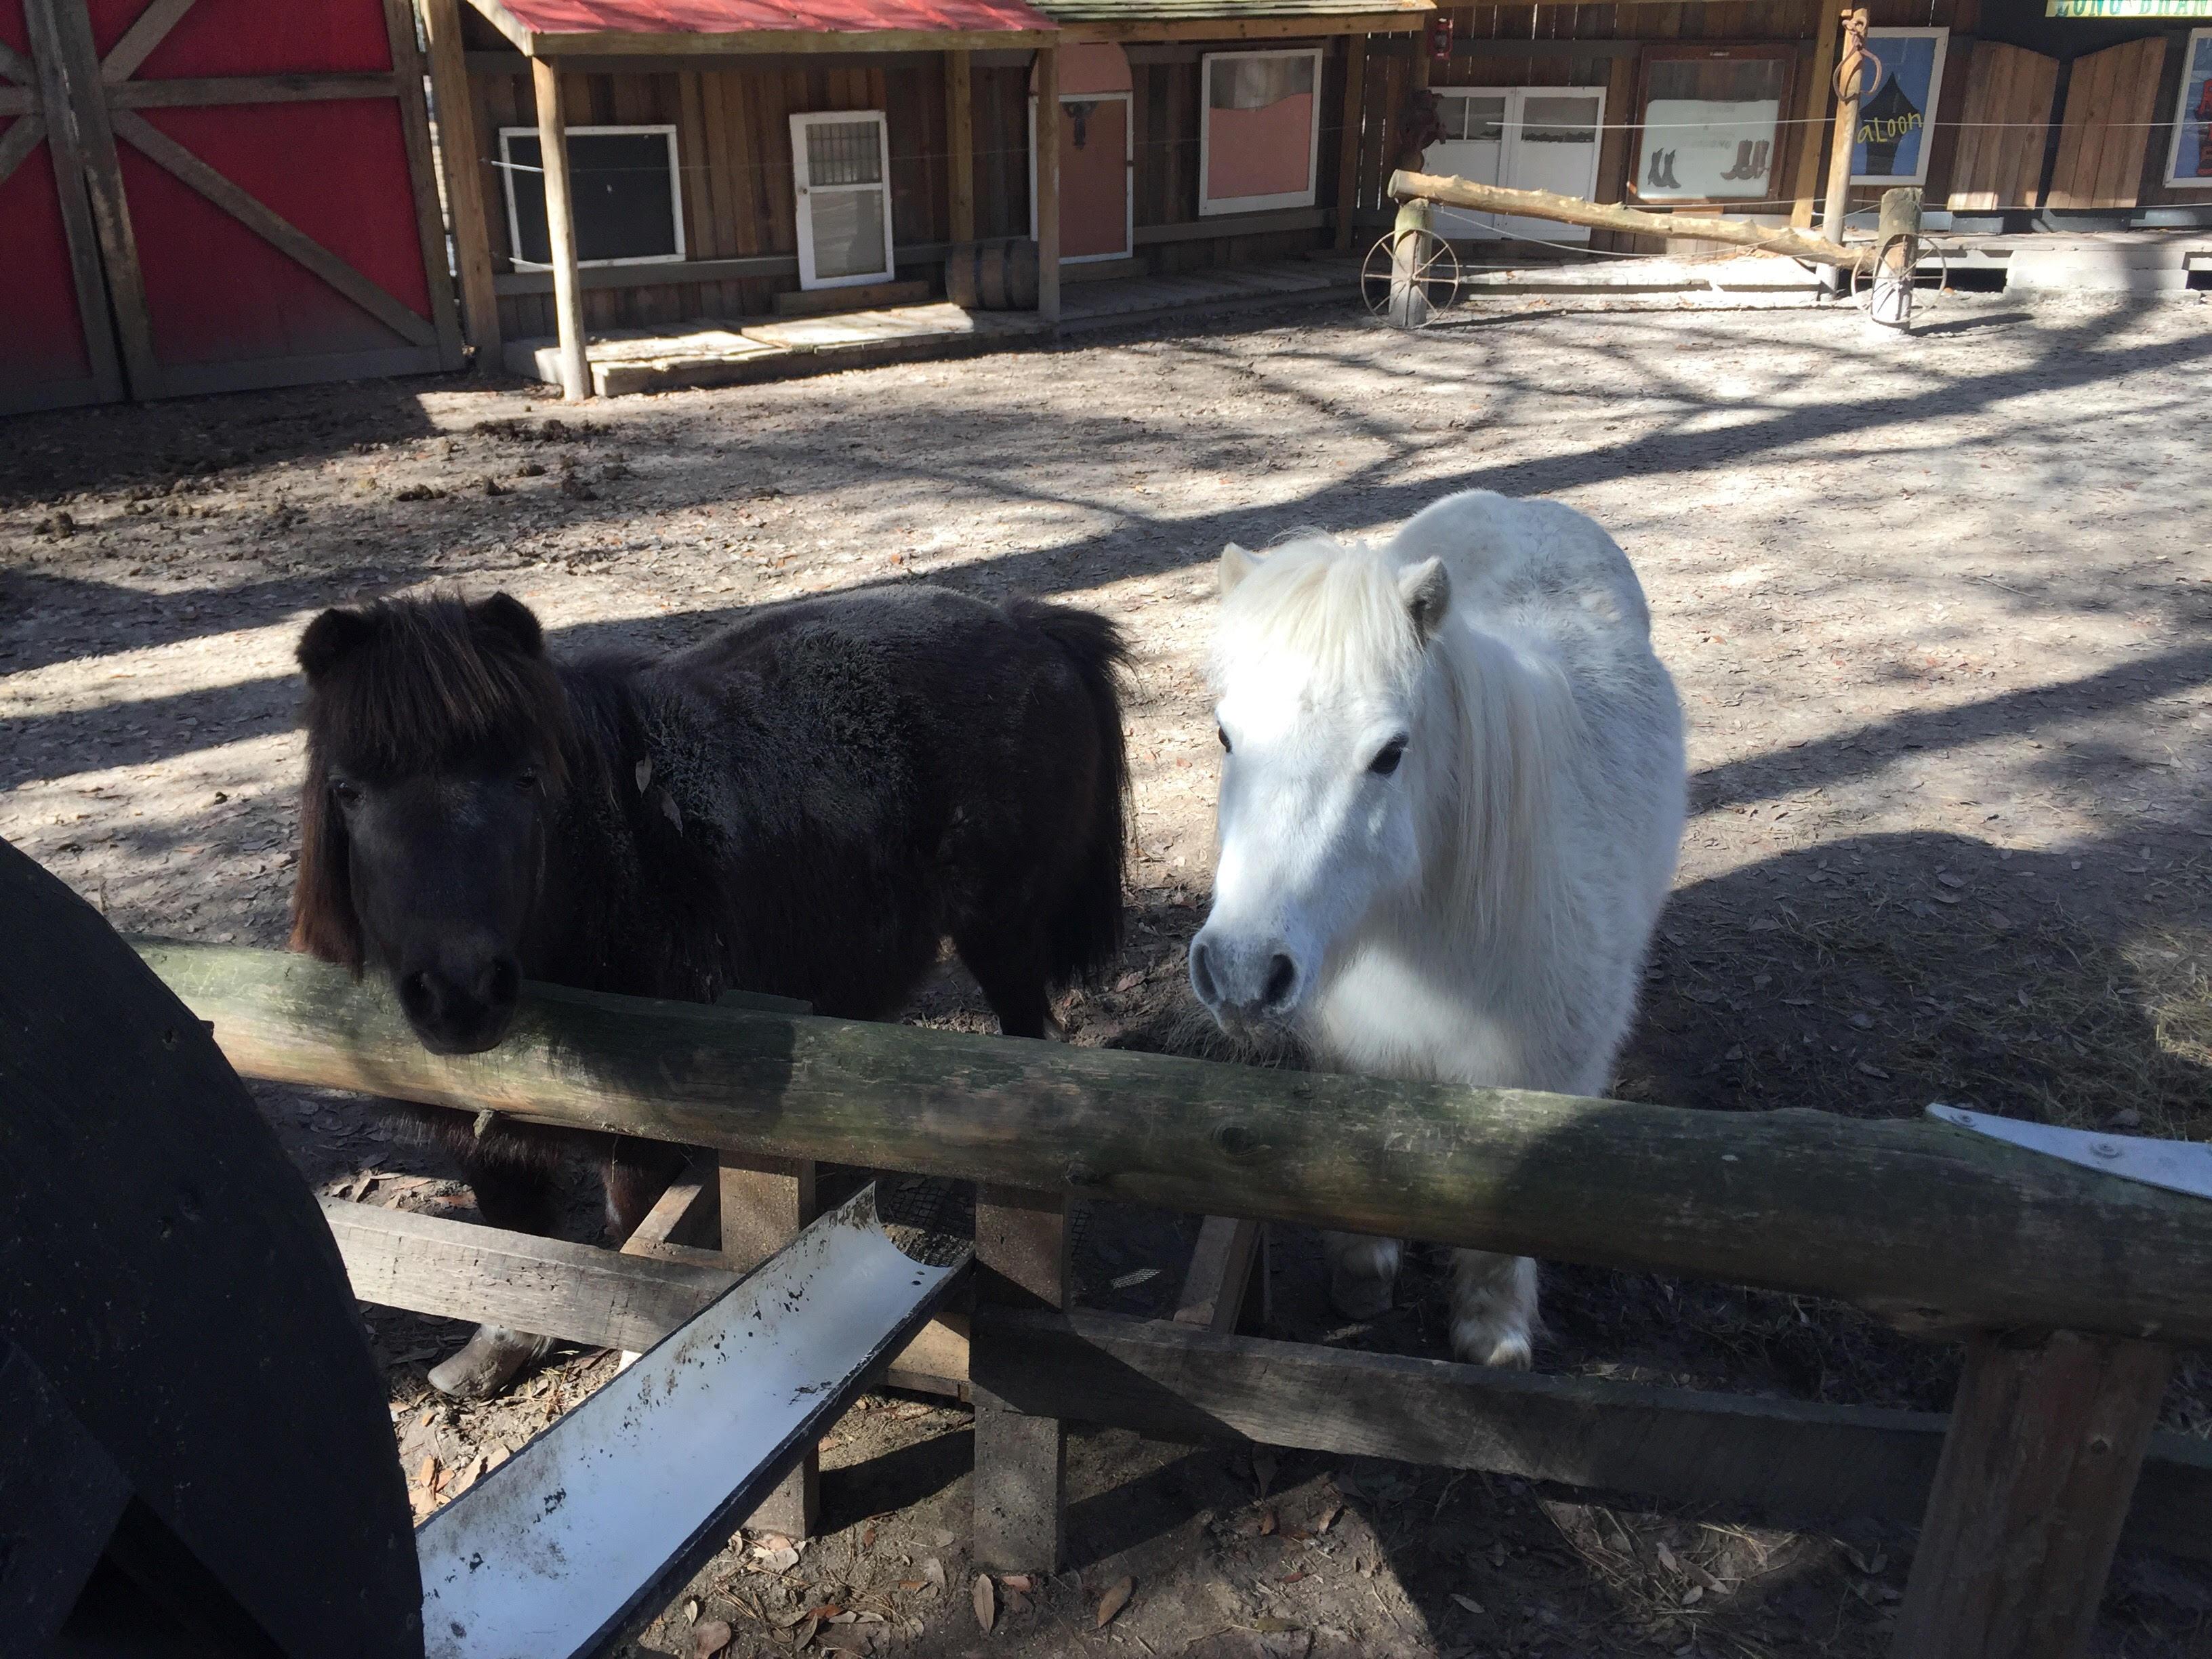 The Mini Horses in Dodge City